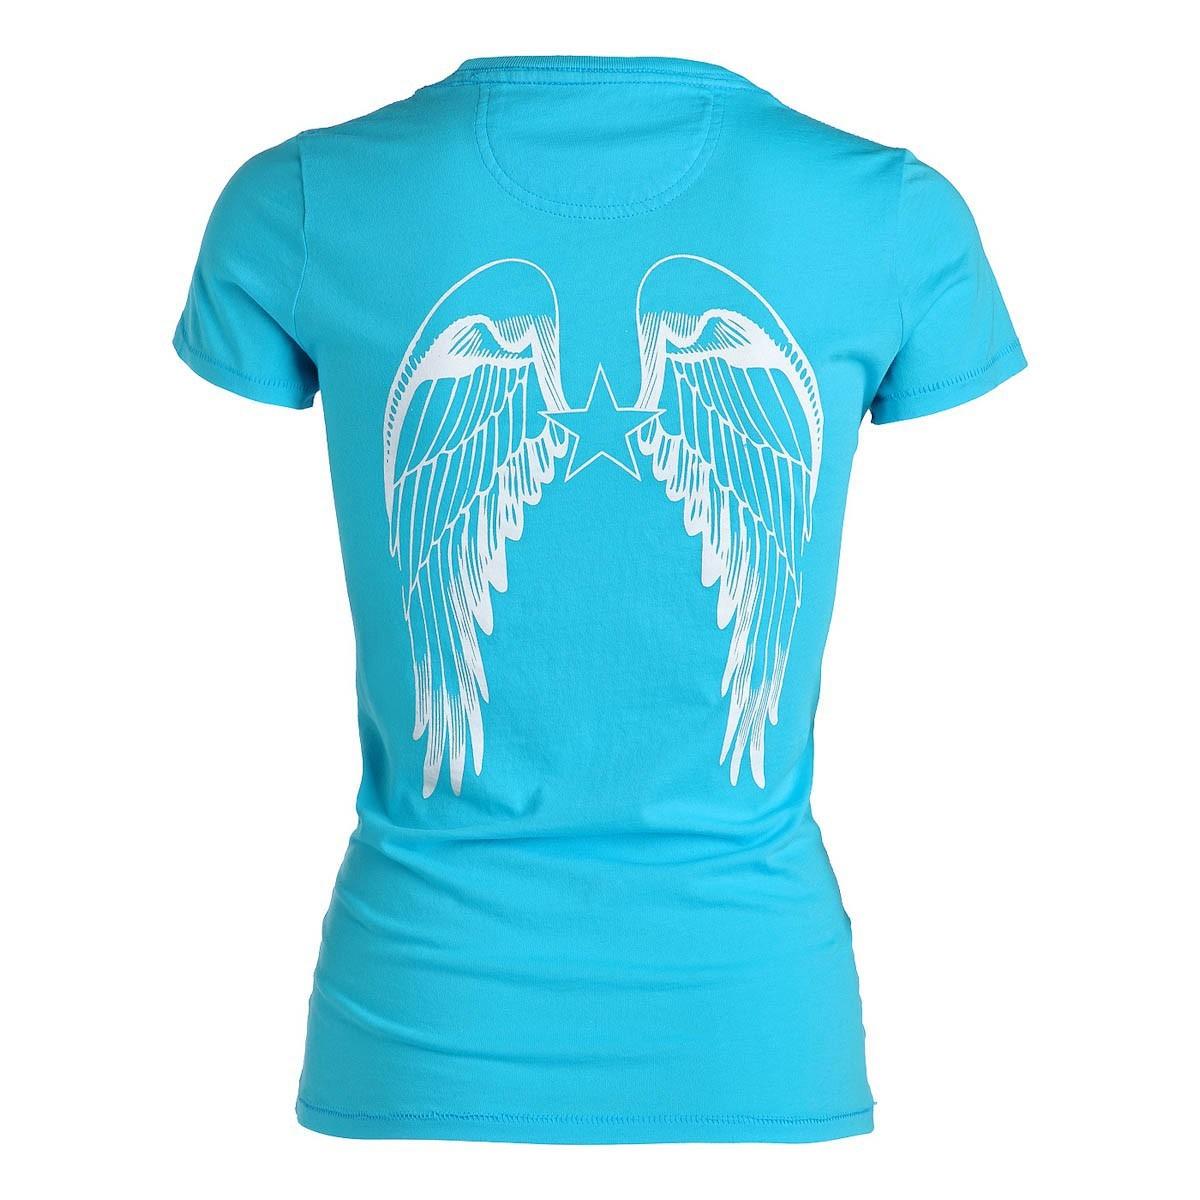 rockstars angels logo t shirt turqoise women t shirts. Black Bedroom Furniture Sets. Home Design Ideas